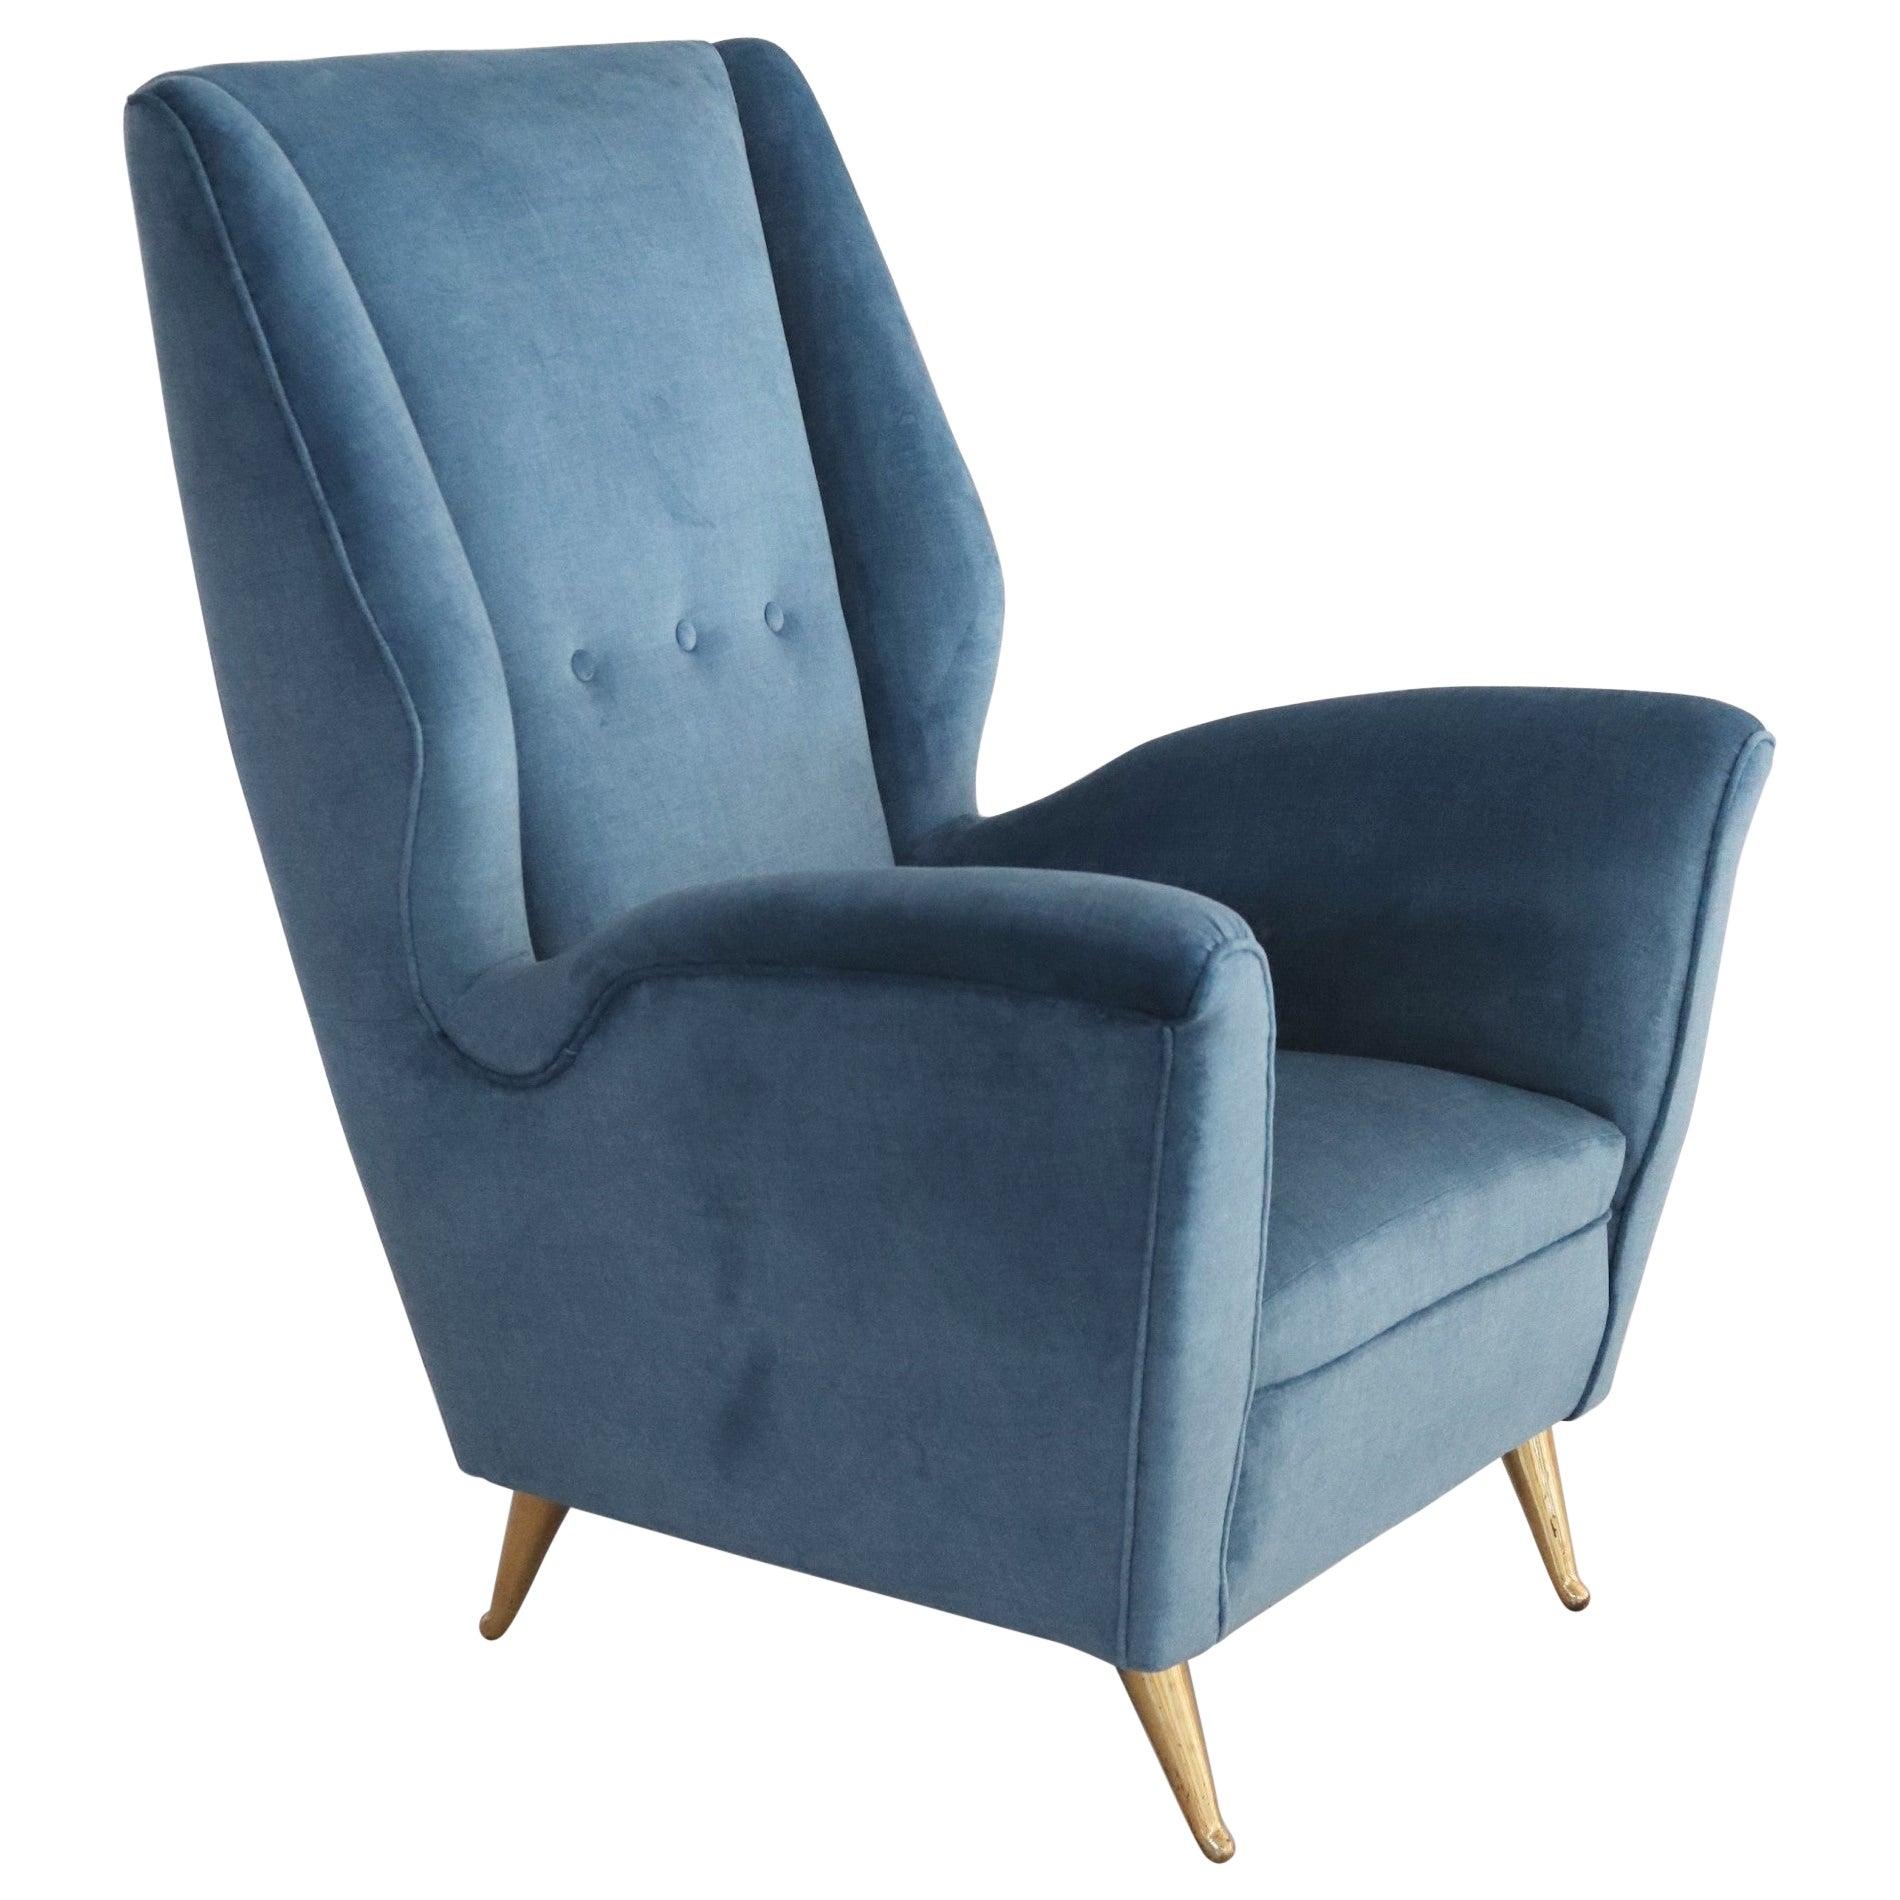 Italian Midcentury Armchair in Blue Velvet and Brass Feet by ISA Bergamo, 1950s